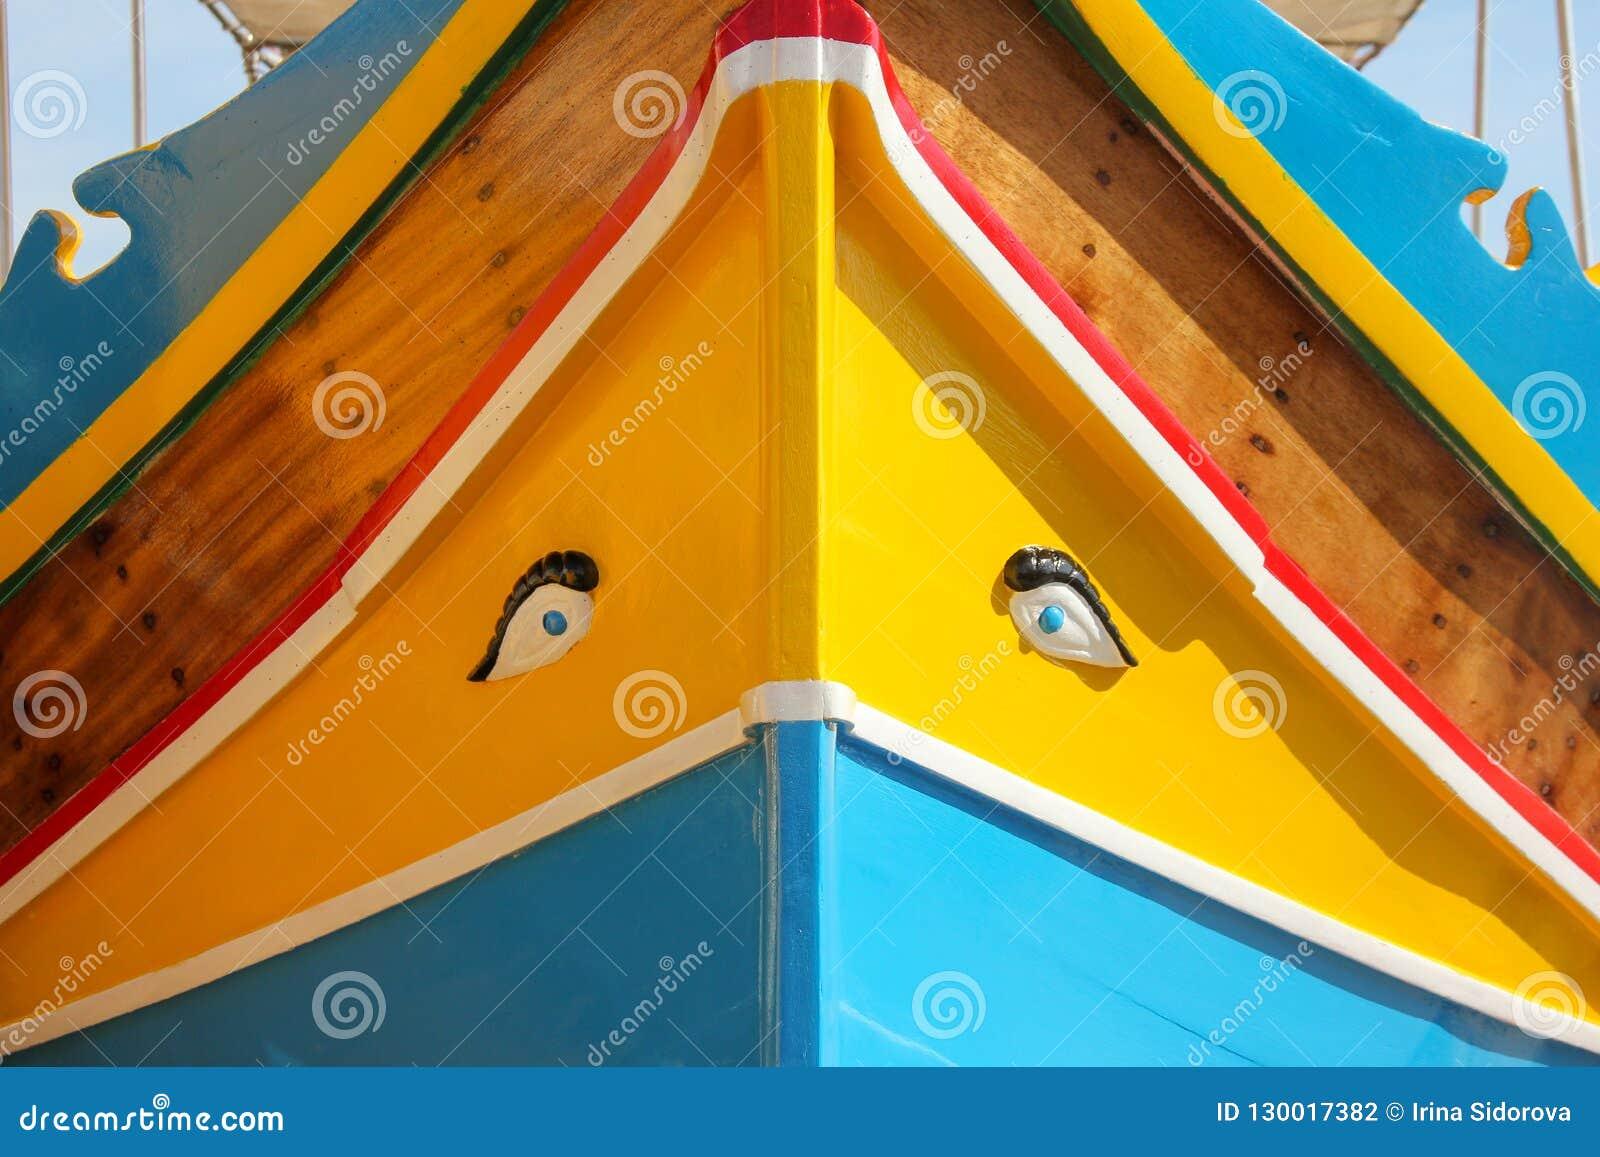 Traditional eyed boats luzzu in fishing village Marsaxlokk, Malta